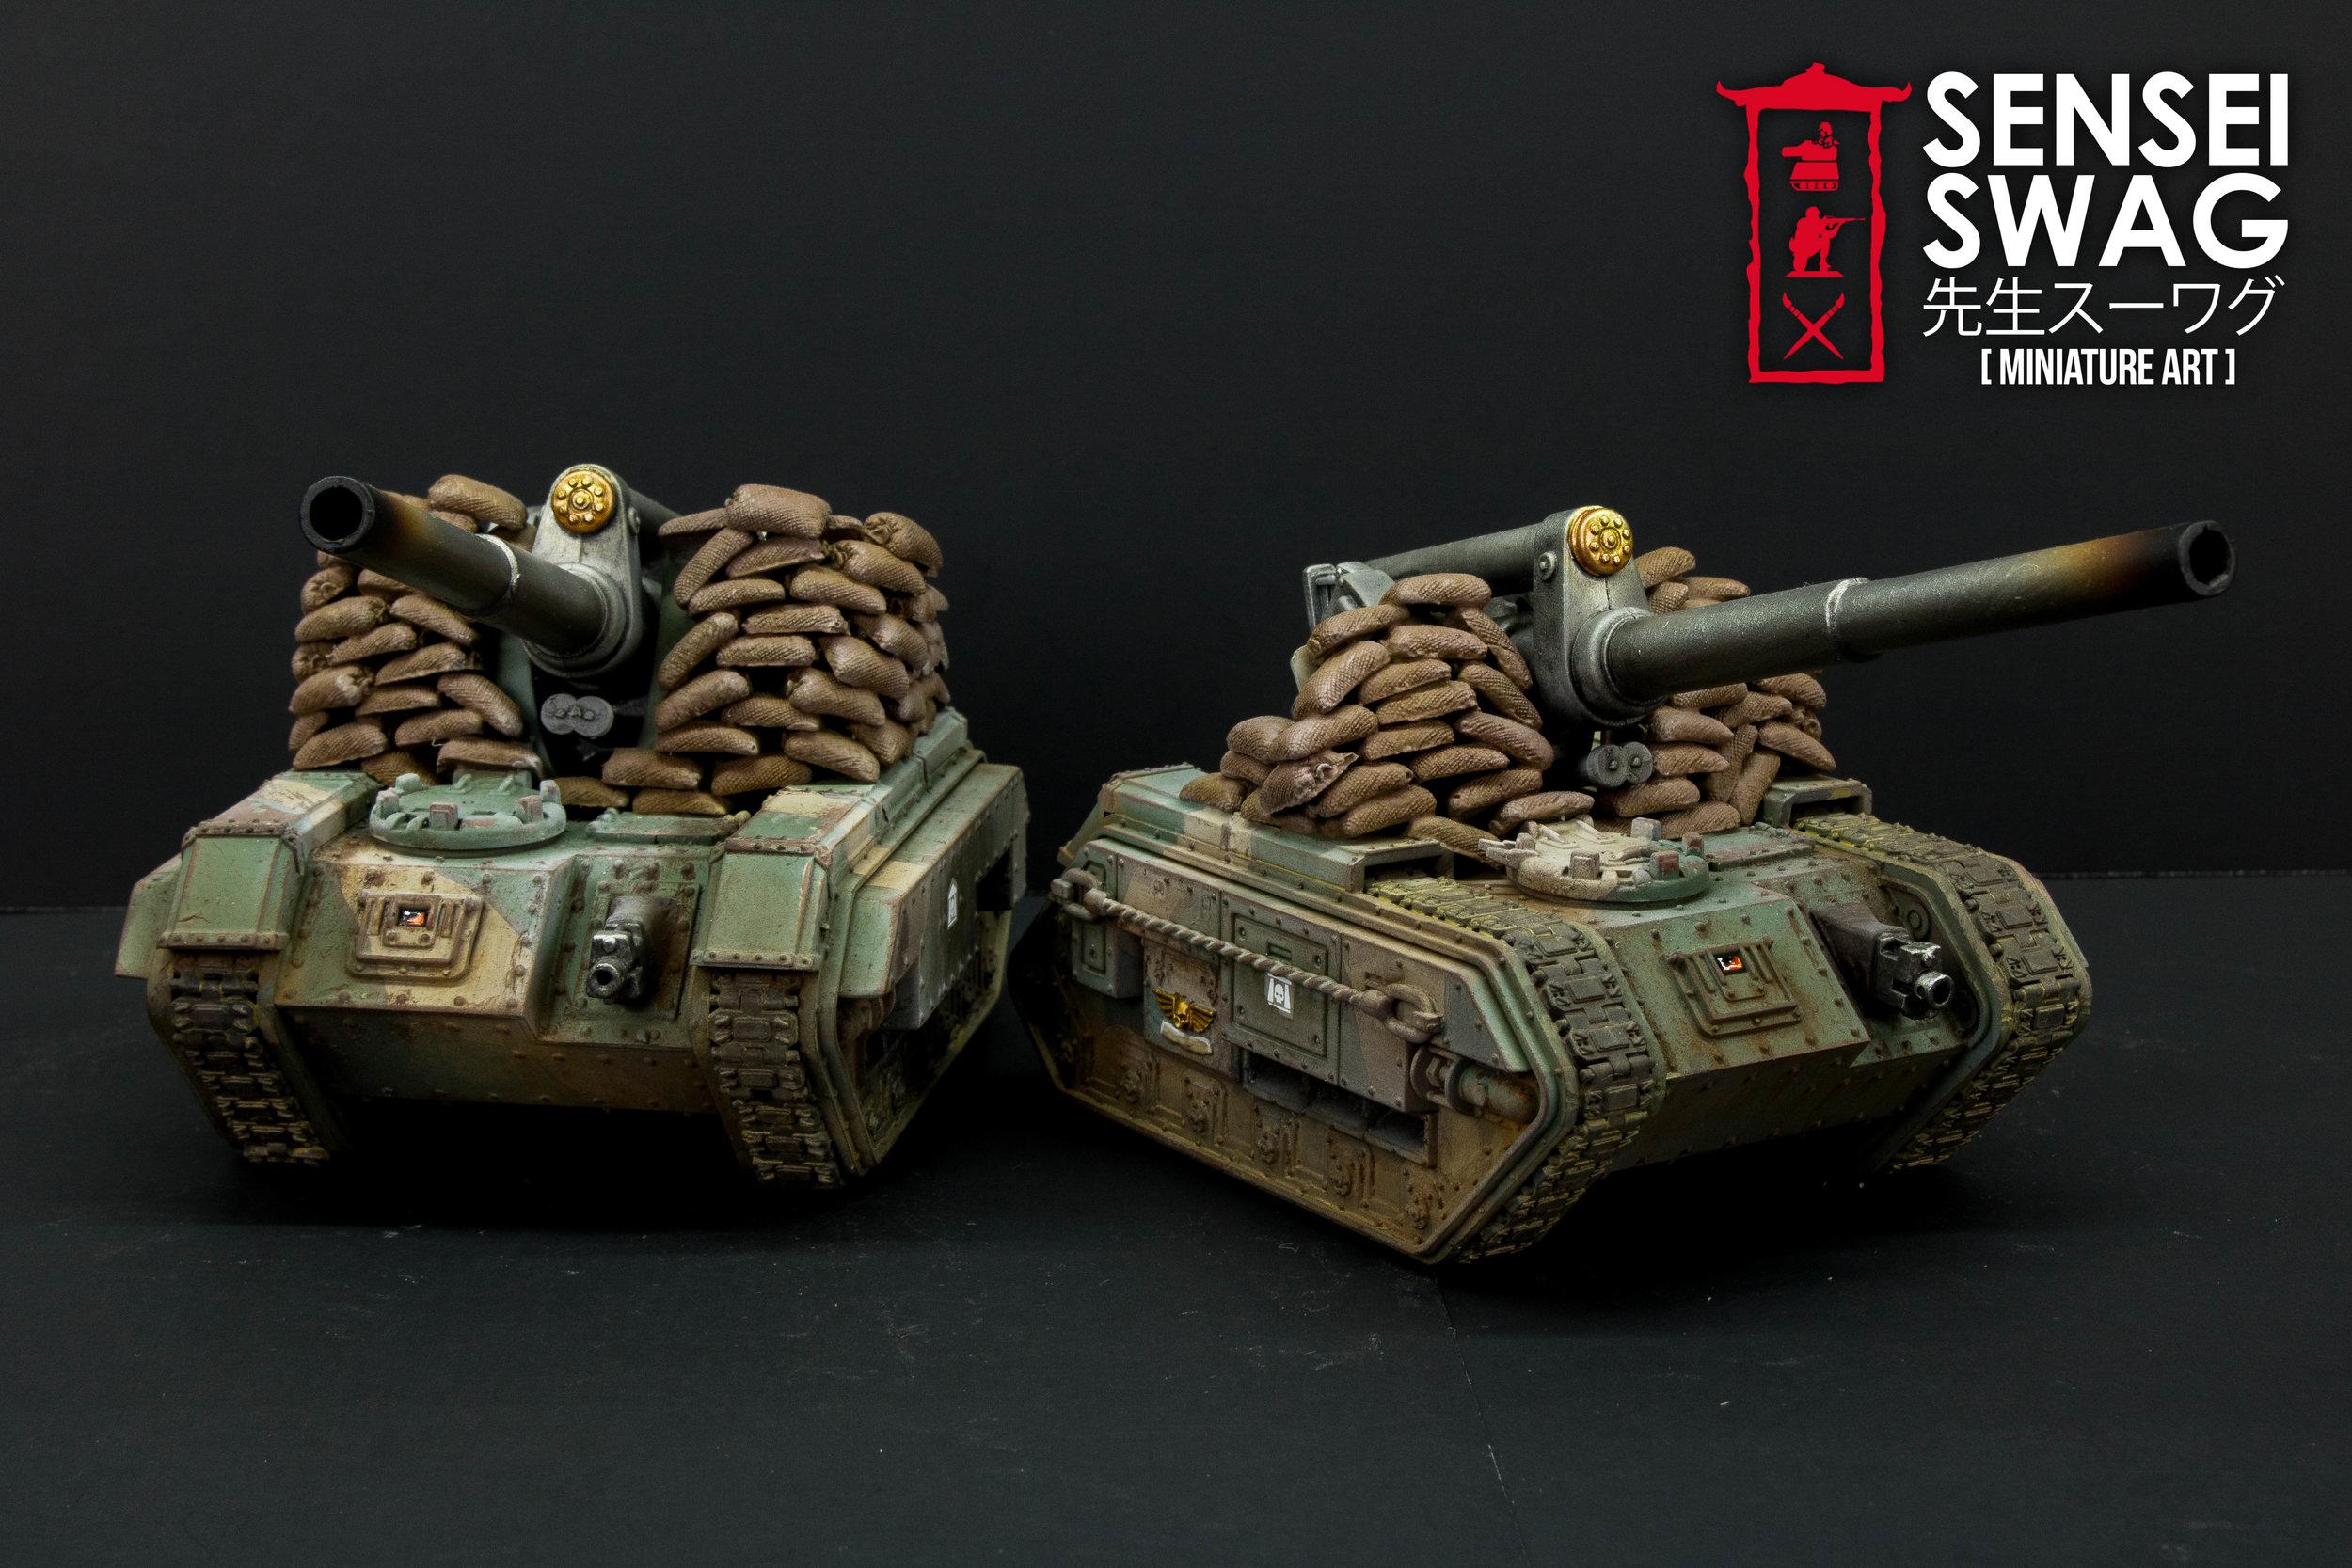 Cadian Armored Company Leman Russ 40k Tanks-9.jpg